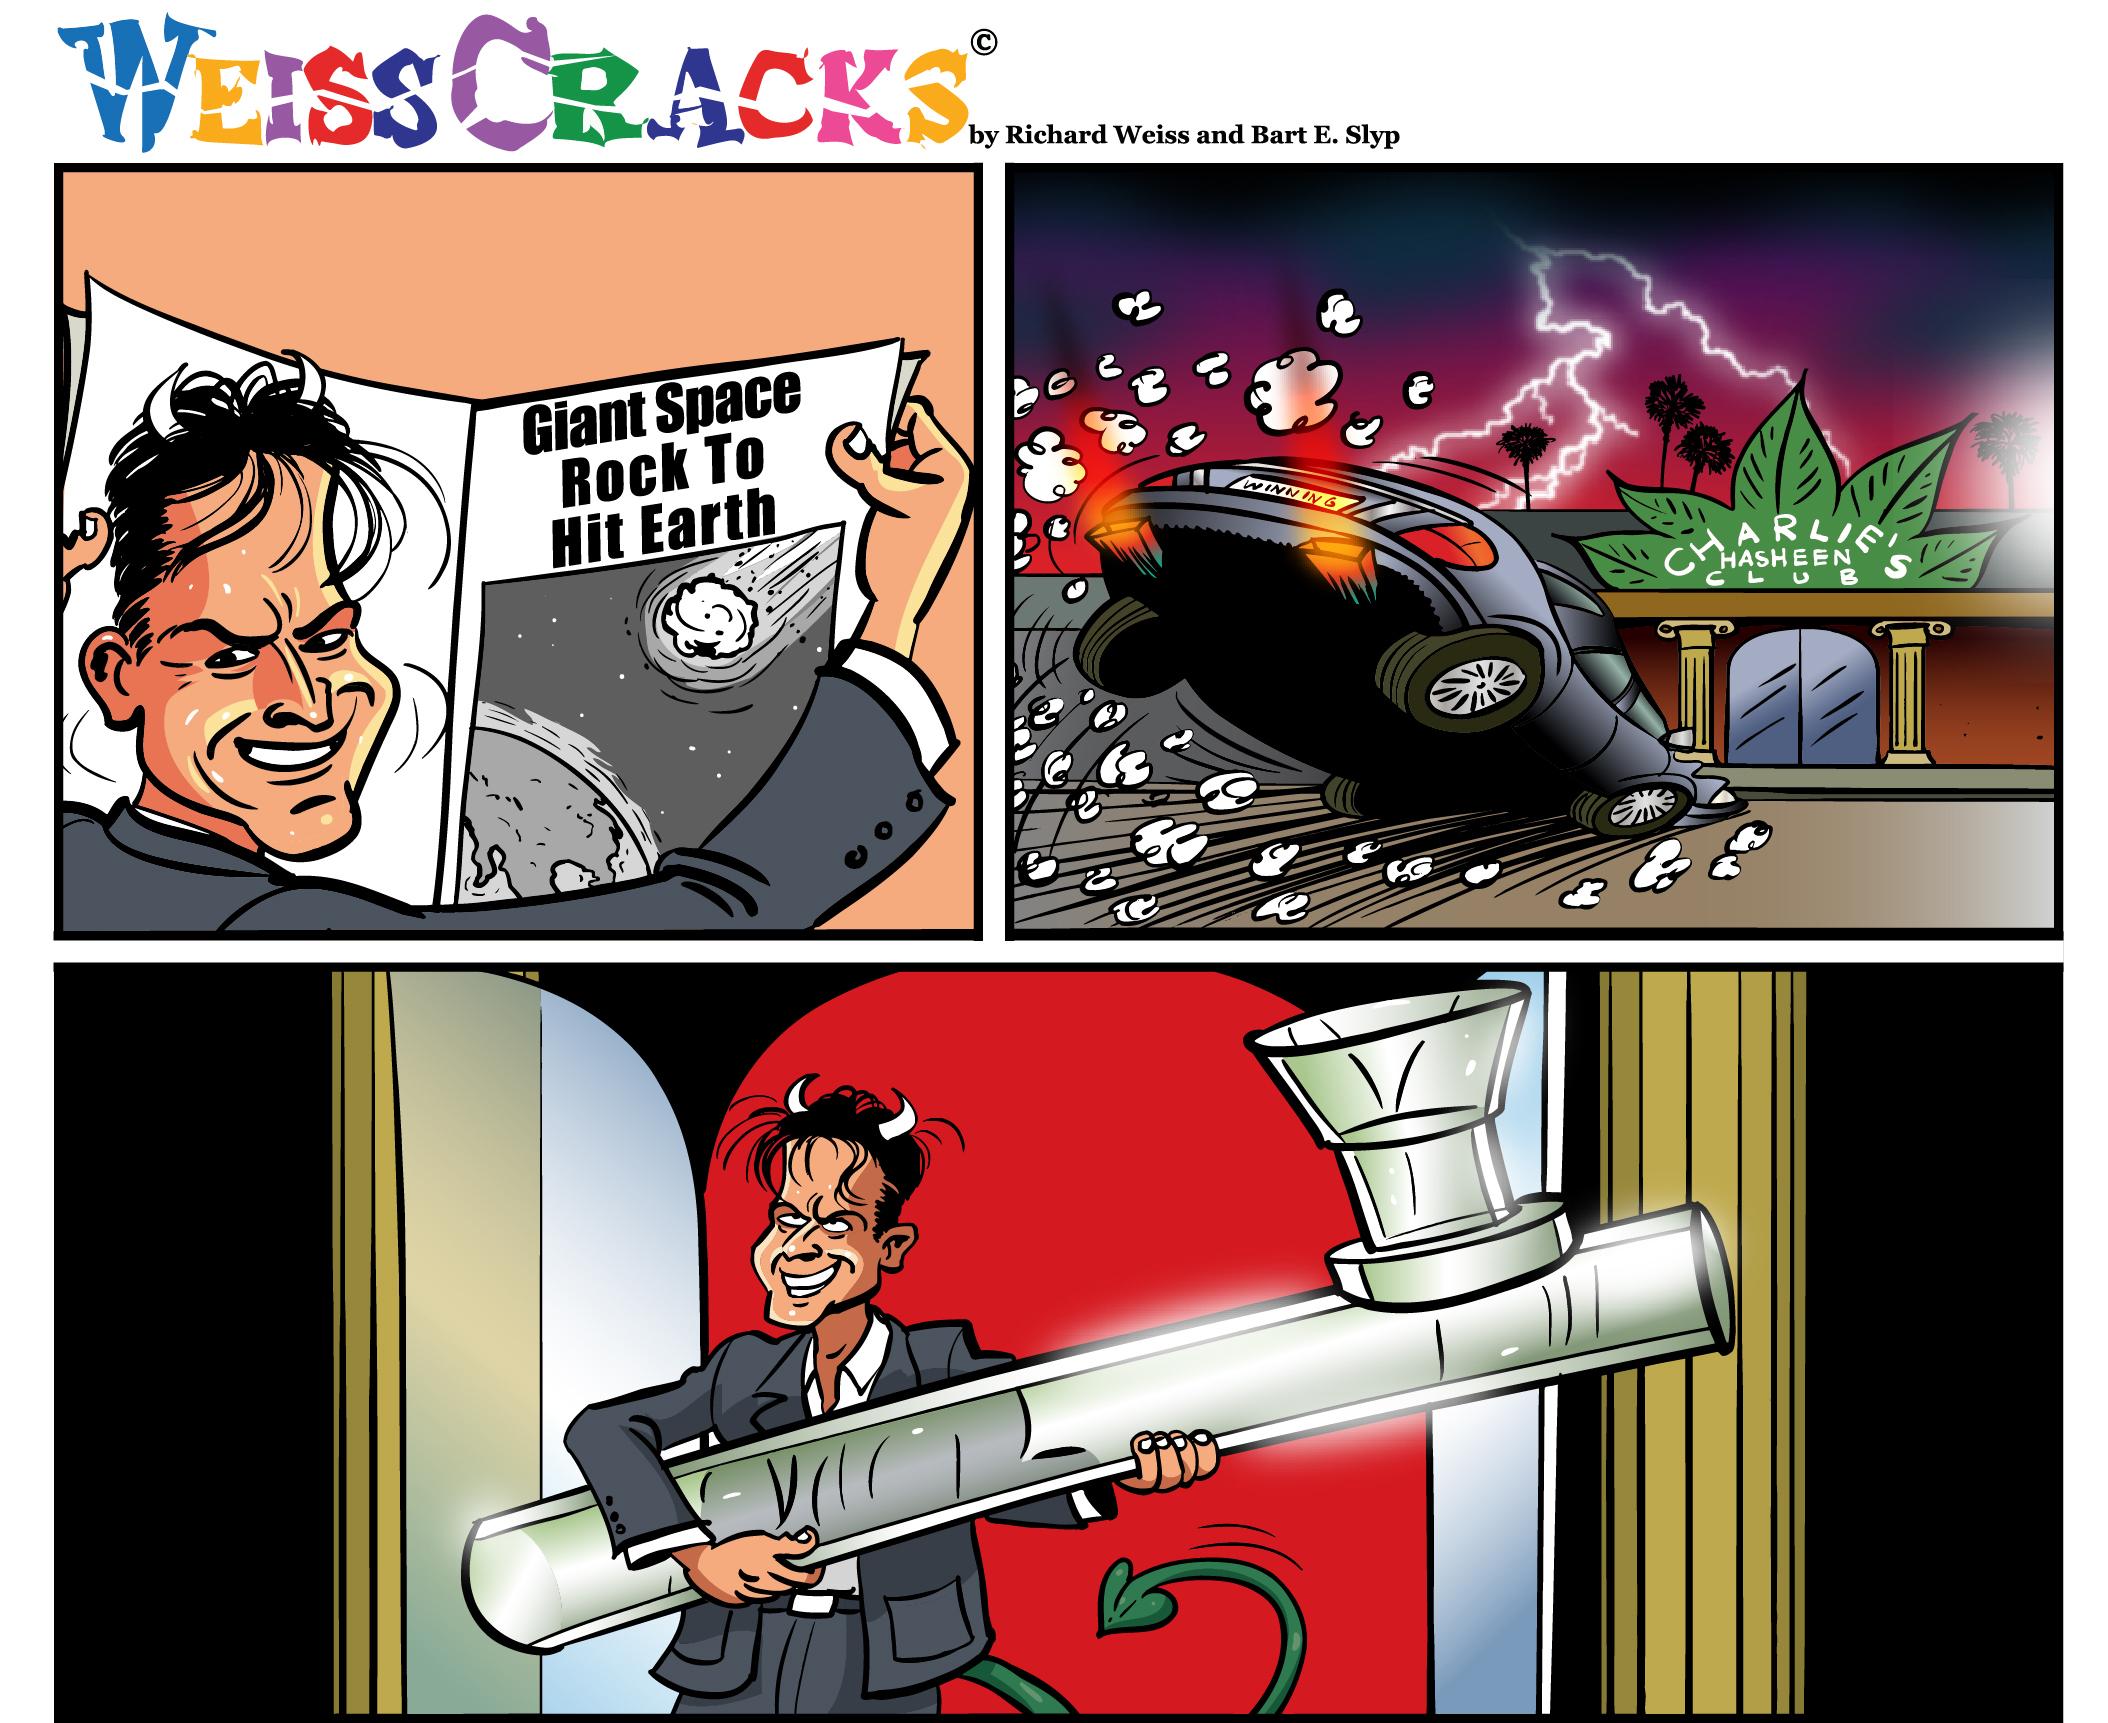 WeissCracks_Space Rock